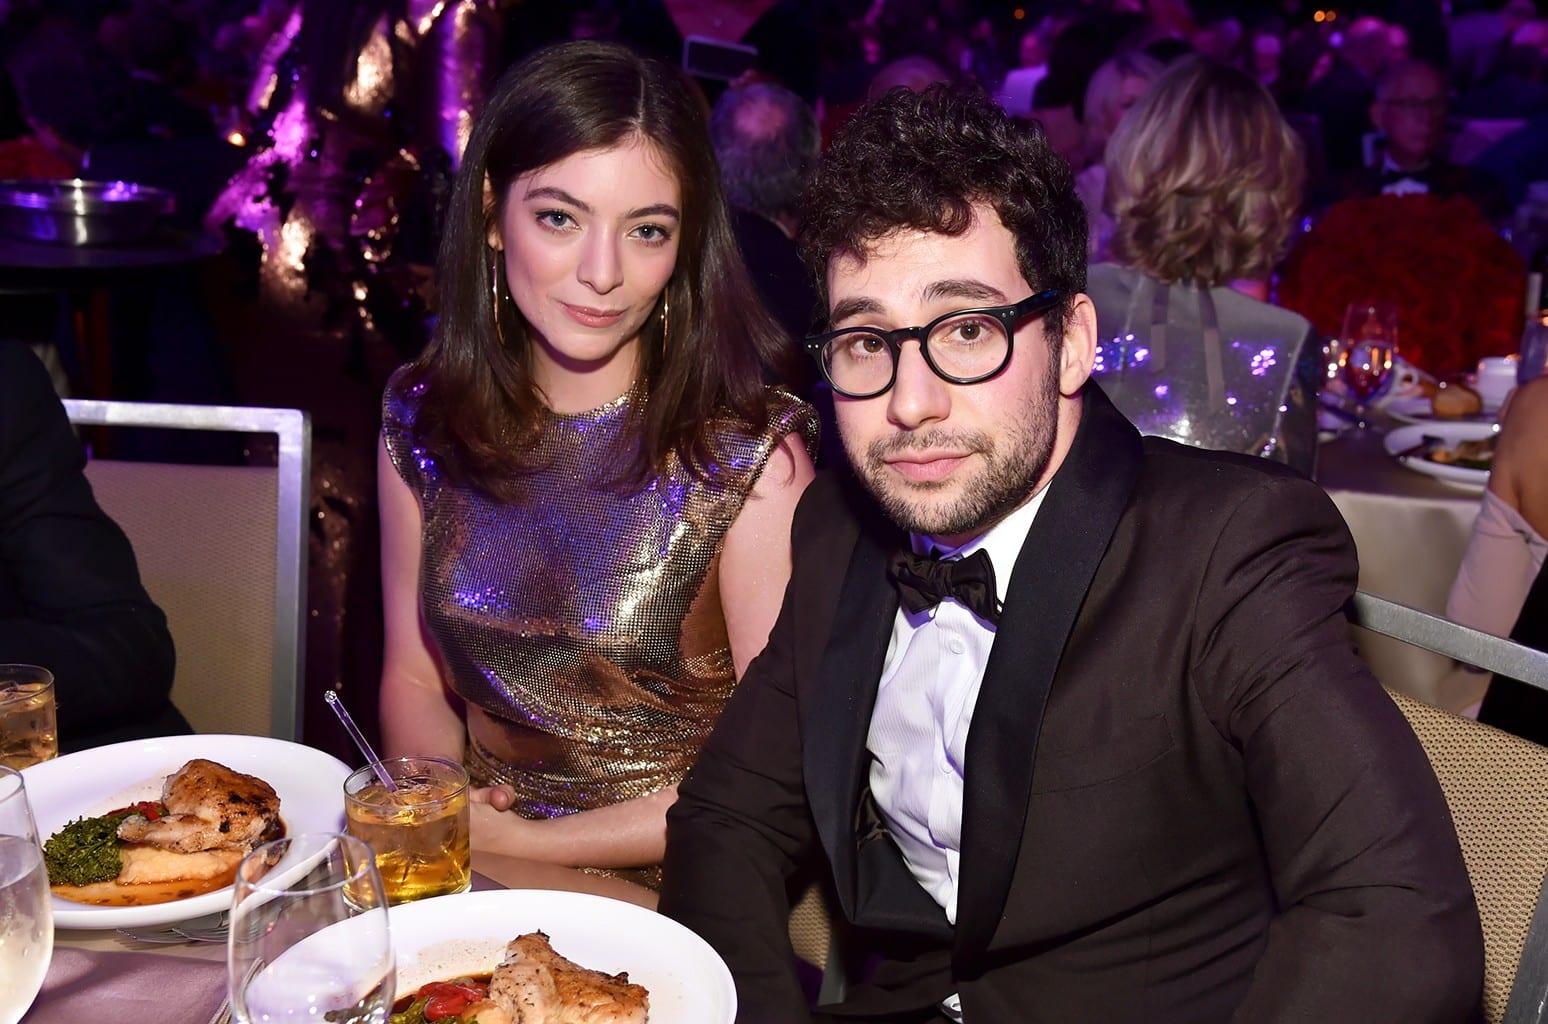 Jack Antonoff and Lorde